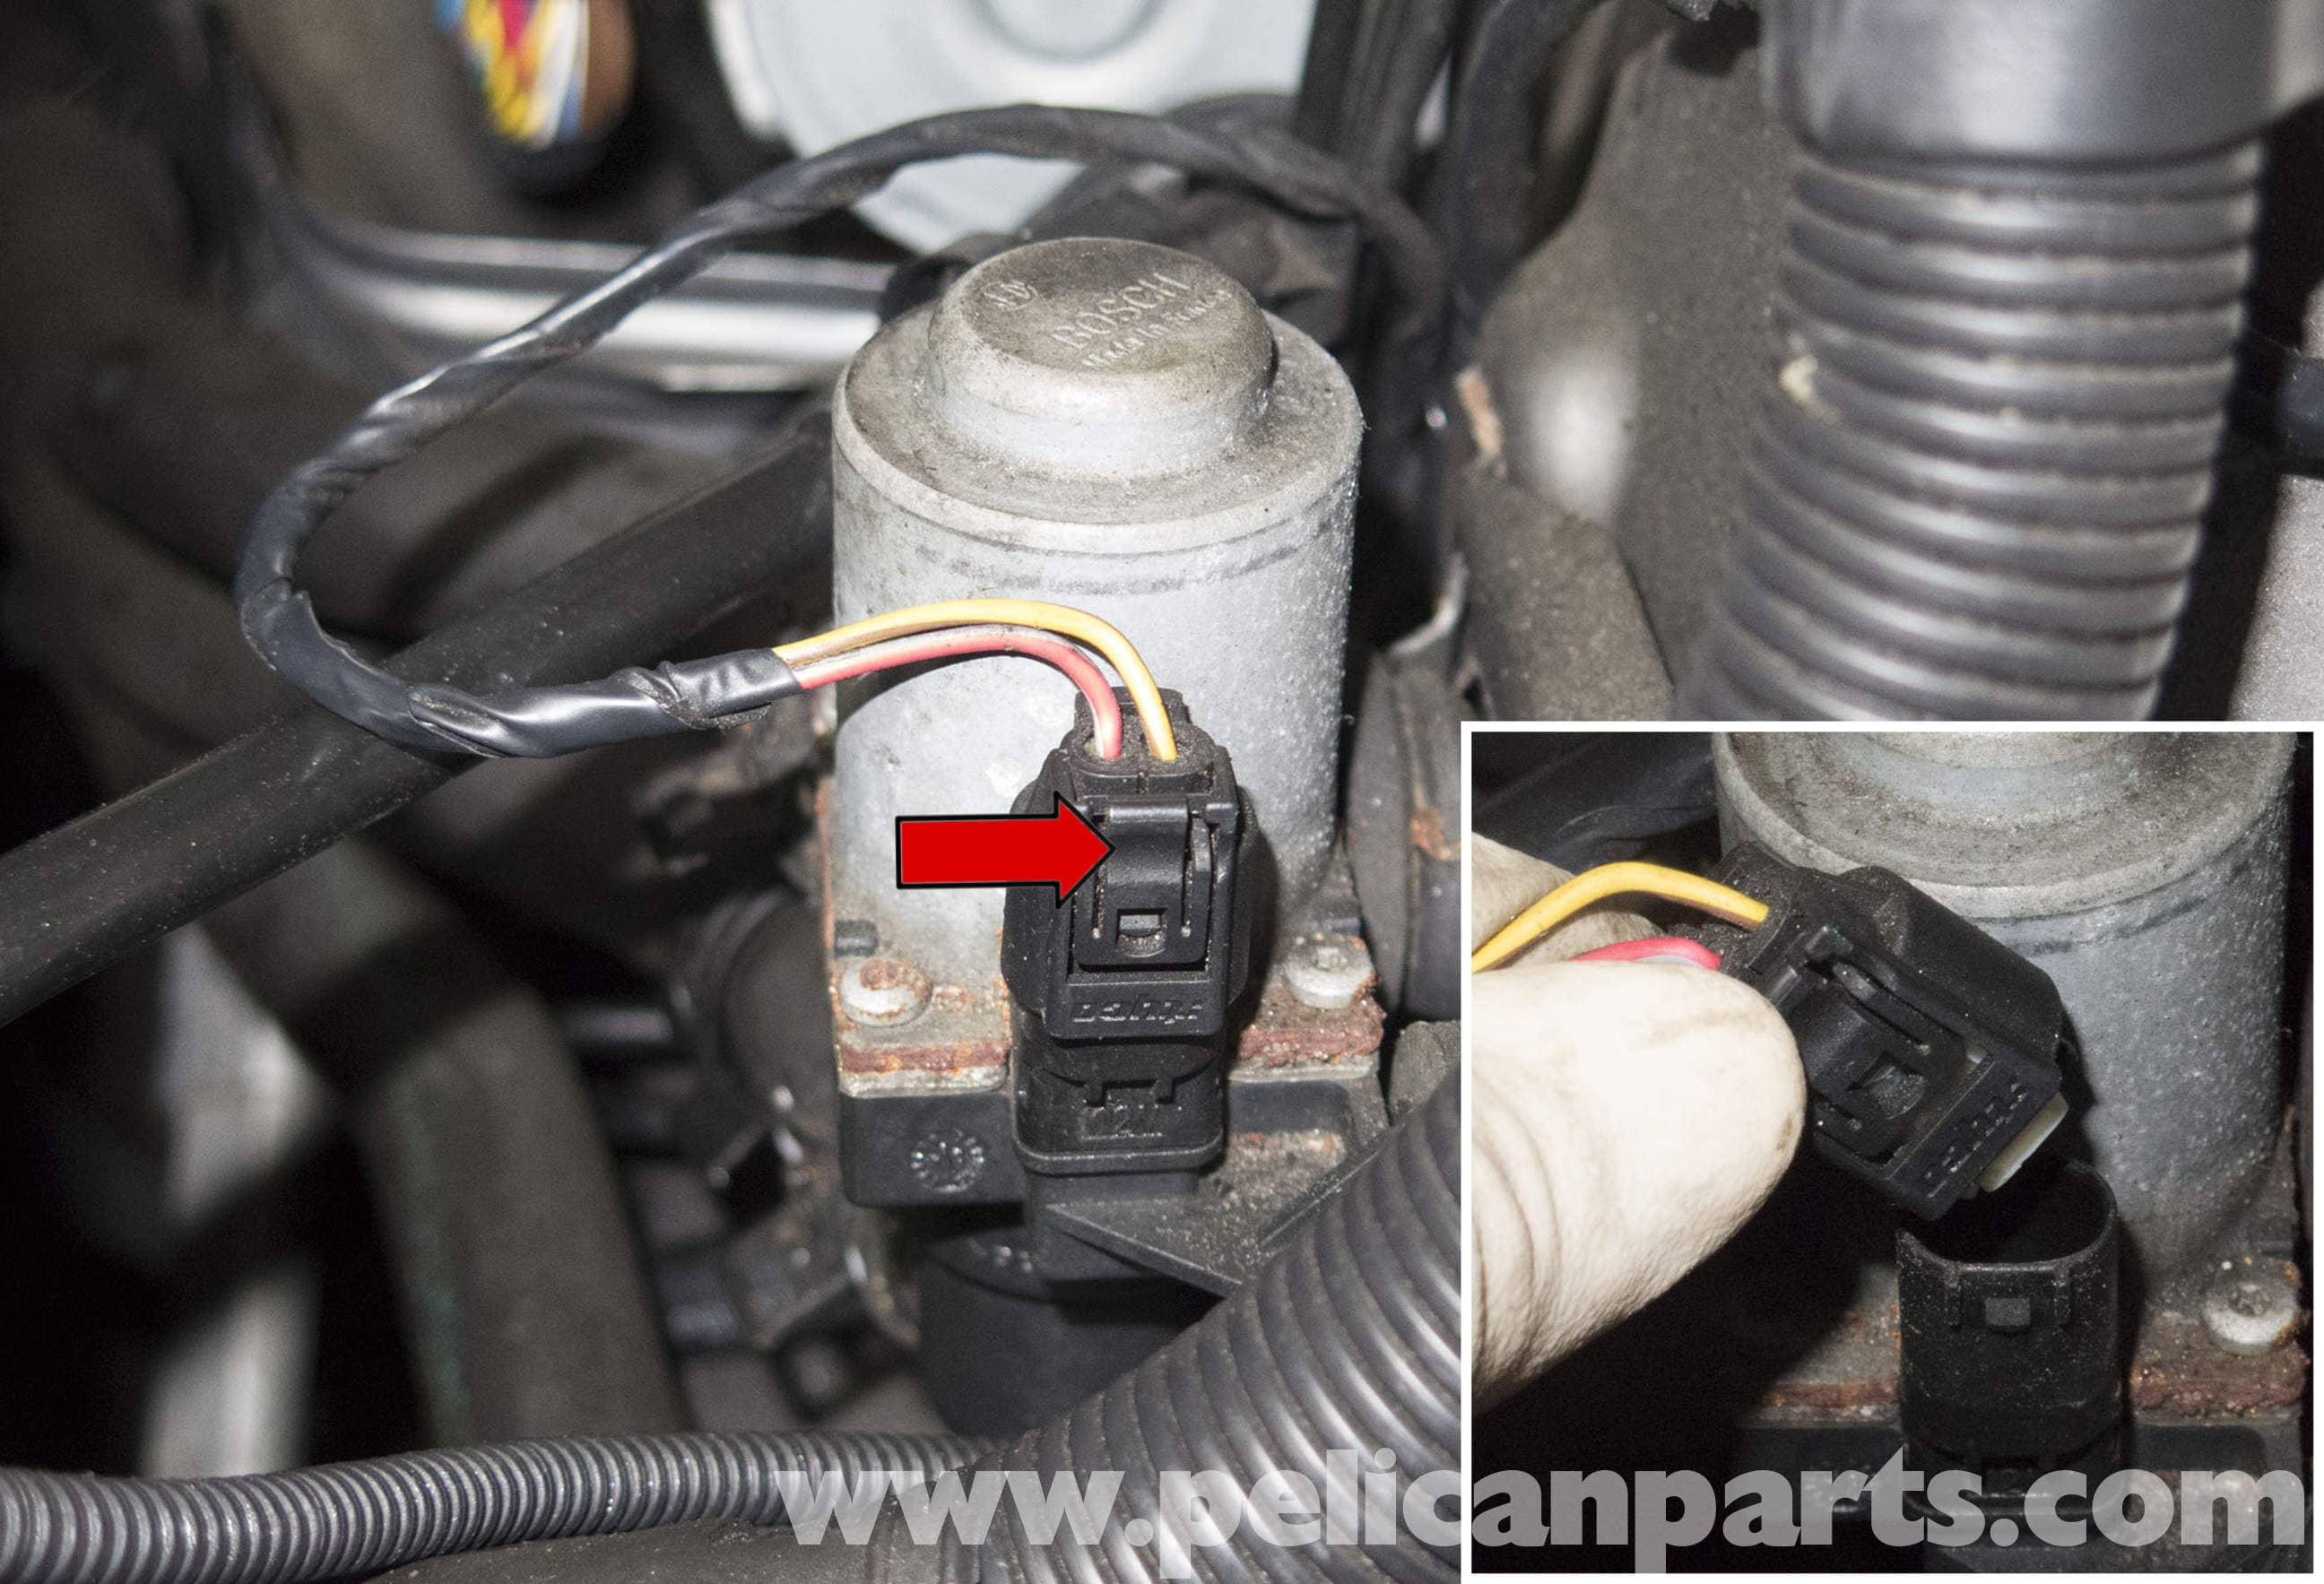 Wondrous Pelican Technical Article Bmw X3 Heater Control Valve Replacement Wiring Cloud Ittabpendurdonanfuldomelitekicepsianuembamohammedshrineorg